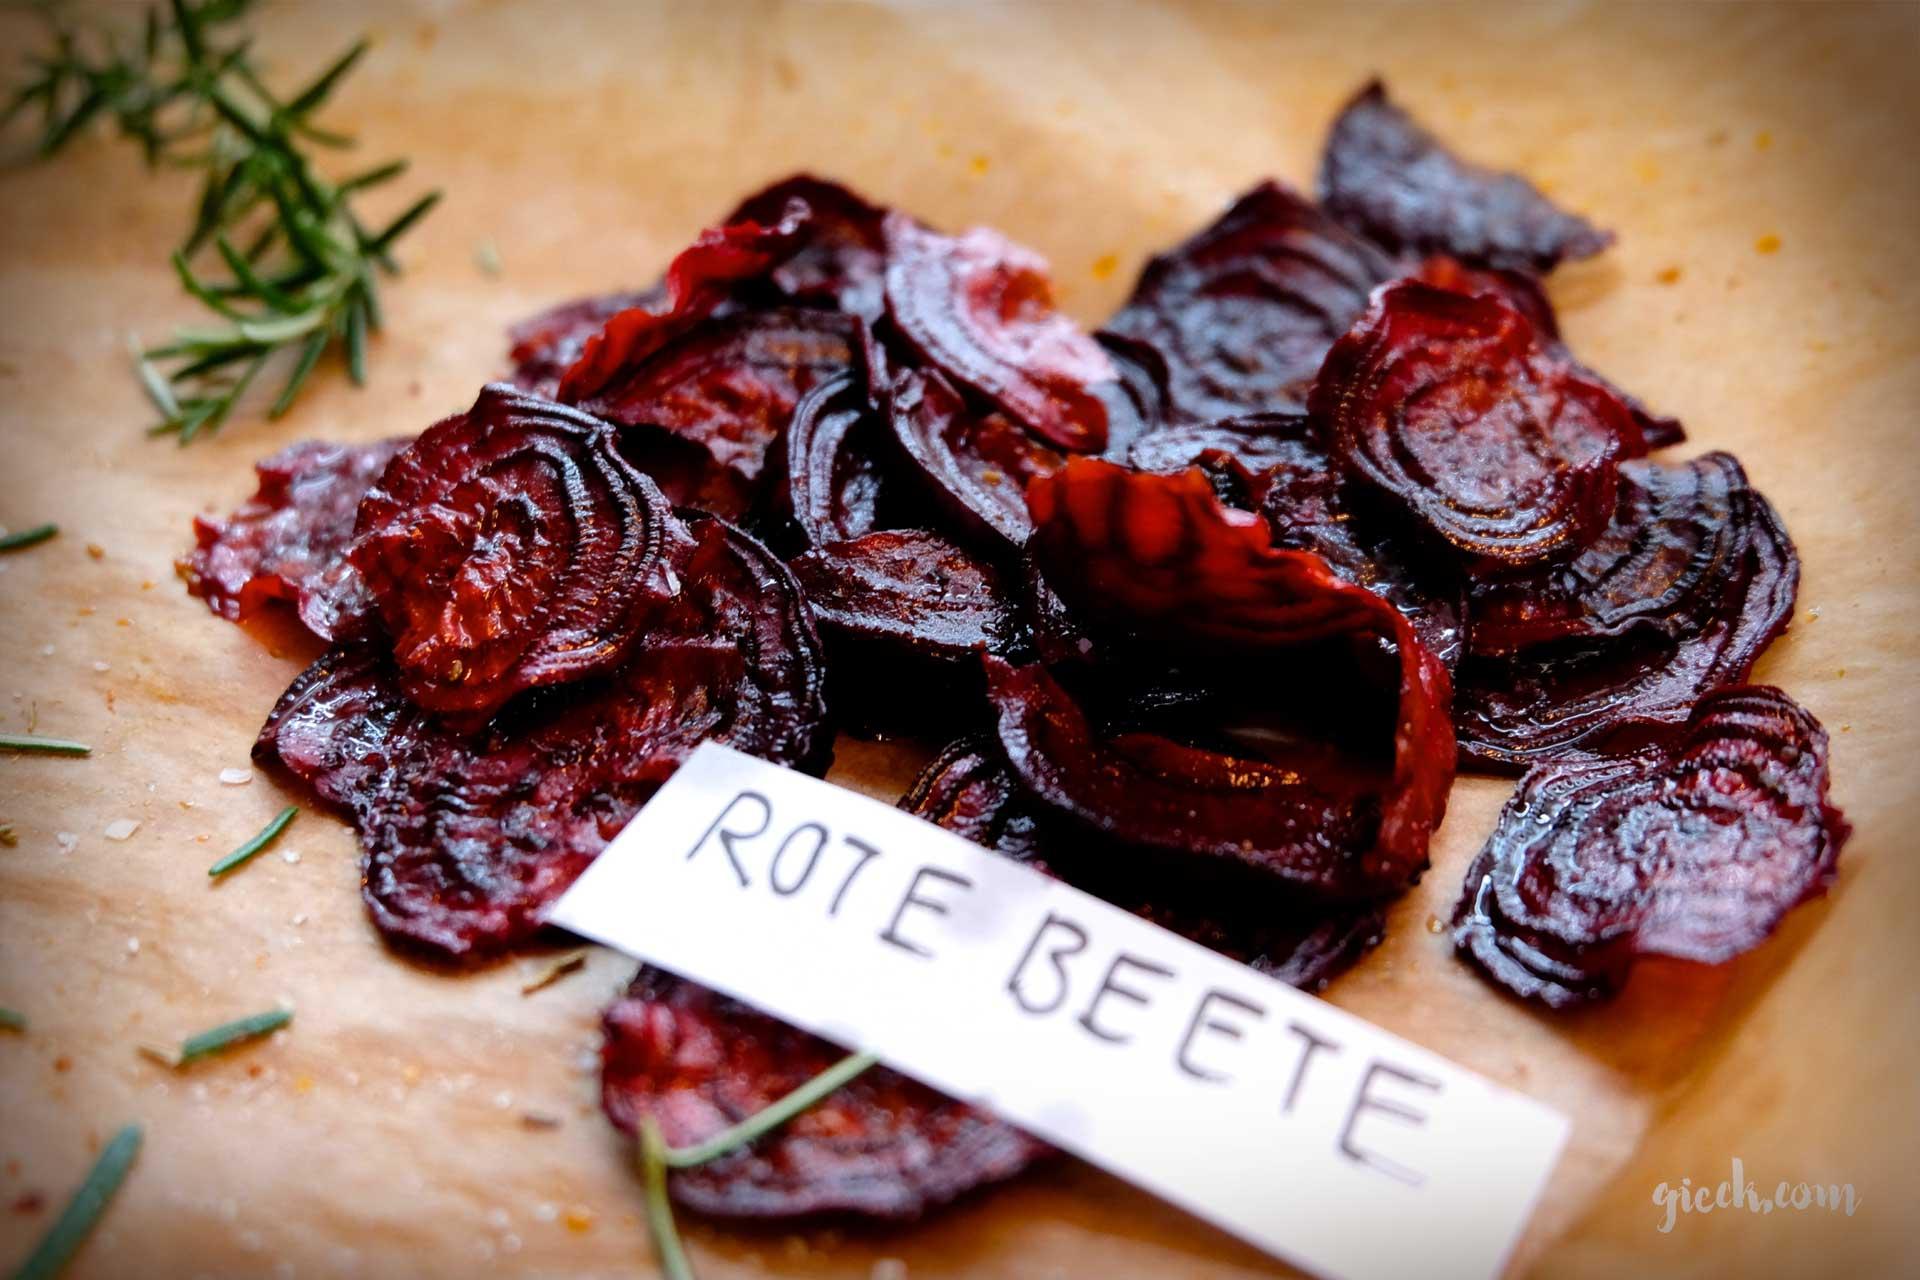 Snacktime: Gemüsechips selber machen